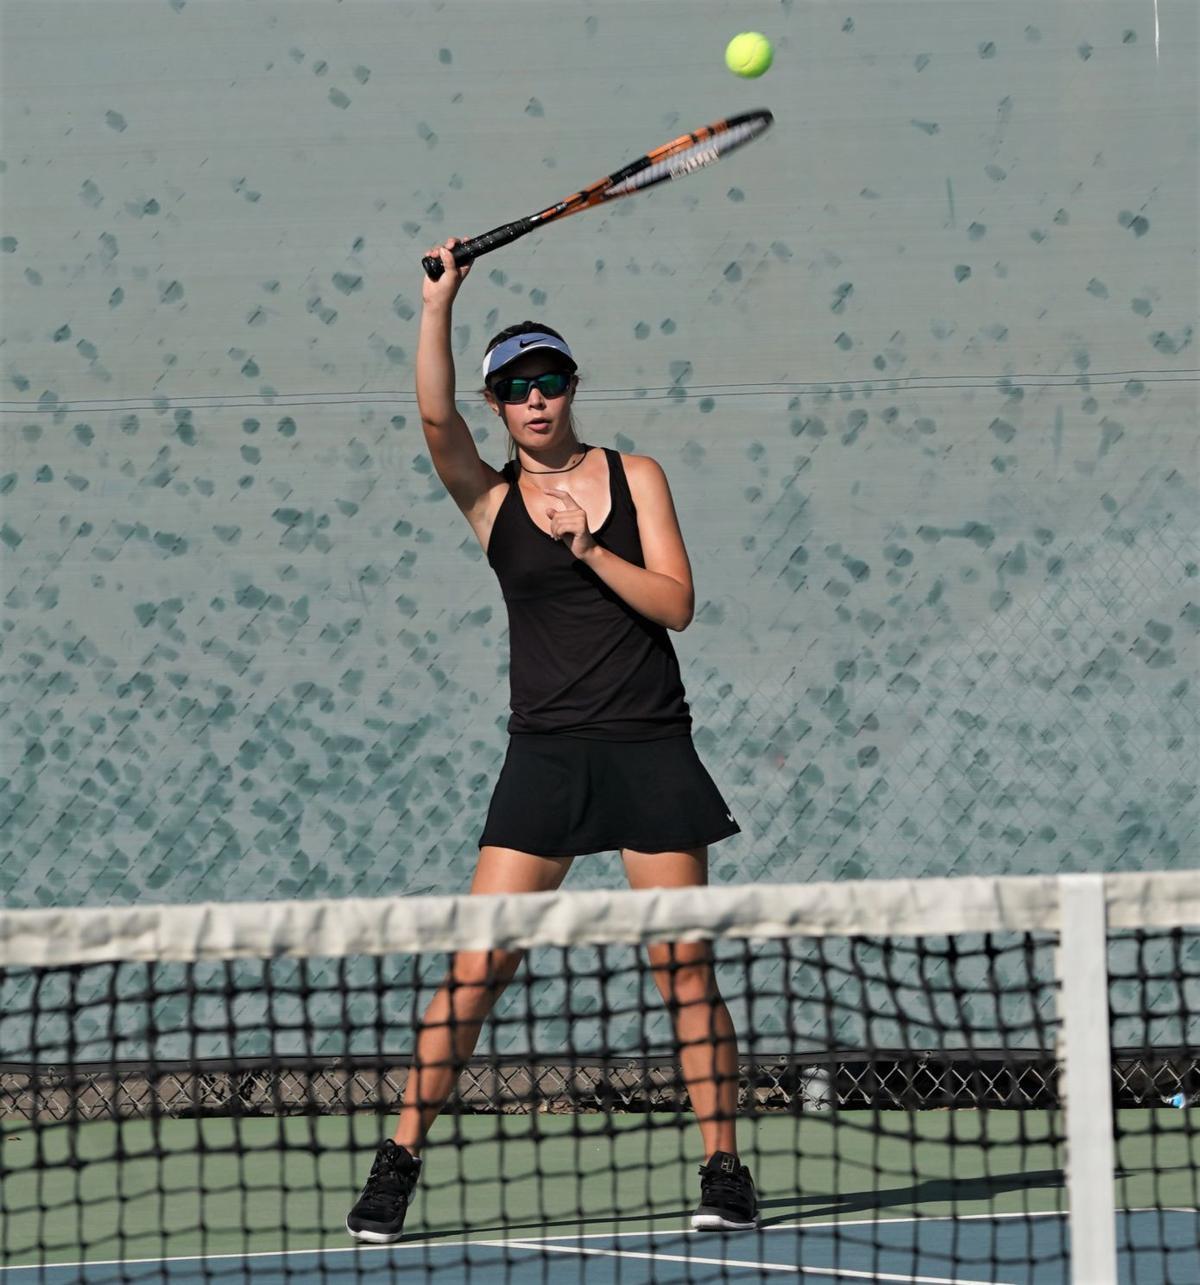 101519 Cab G Tennis 03.JPG